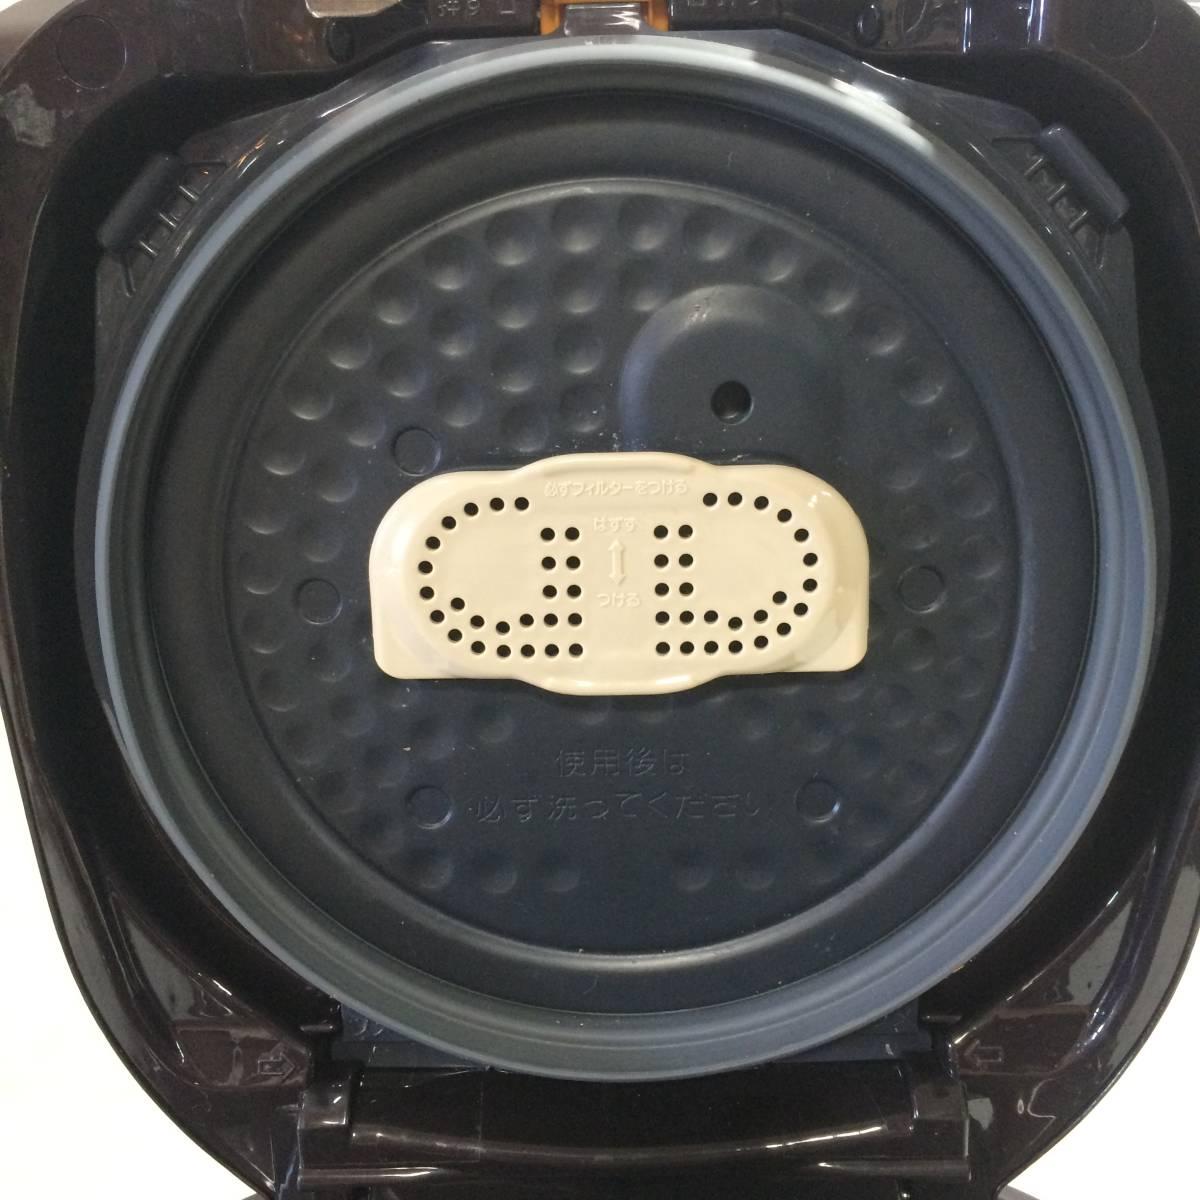 ZOJIRUSHI 象印 NP-ZF18-TD IHジャー 炊飯器 1升 1.8L 2017年製 【中古品】_画像7